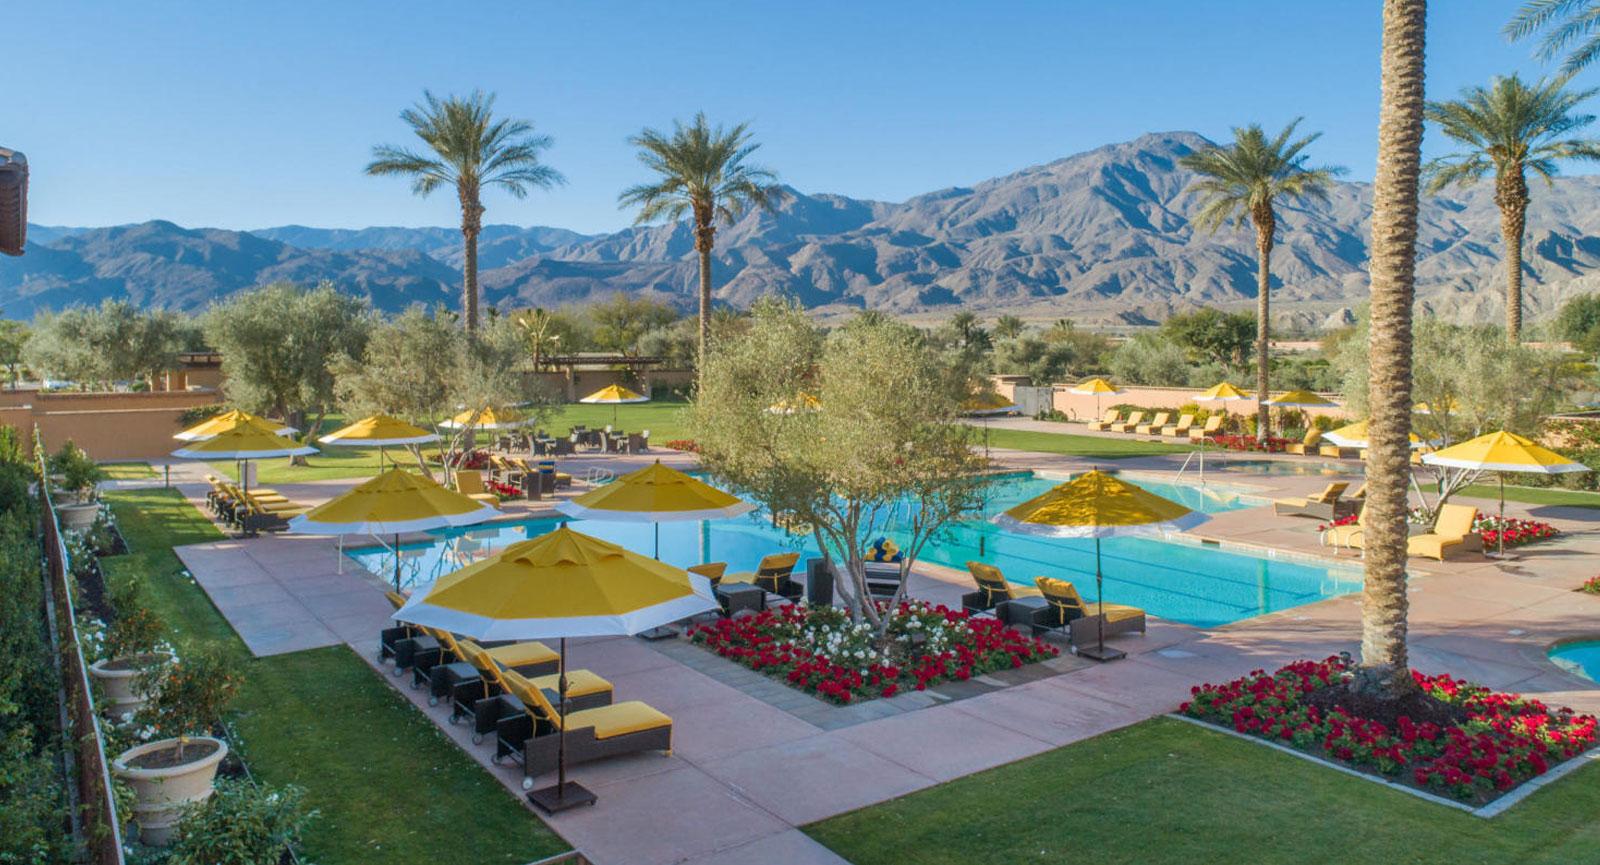 Vacation Home Rentals at Coachella Valley